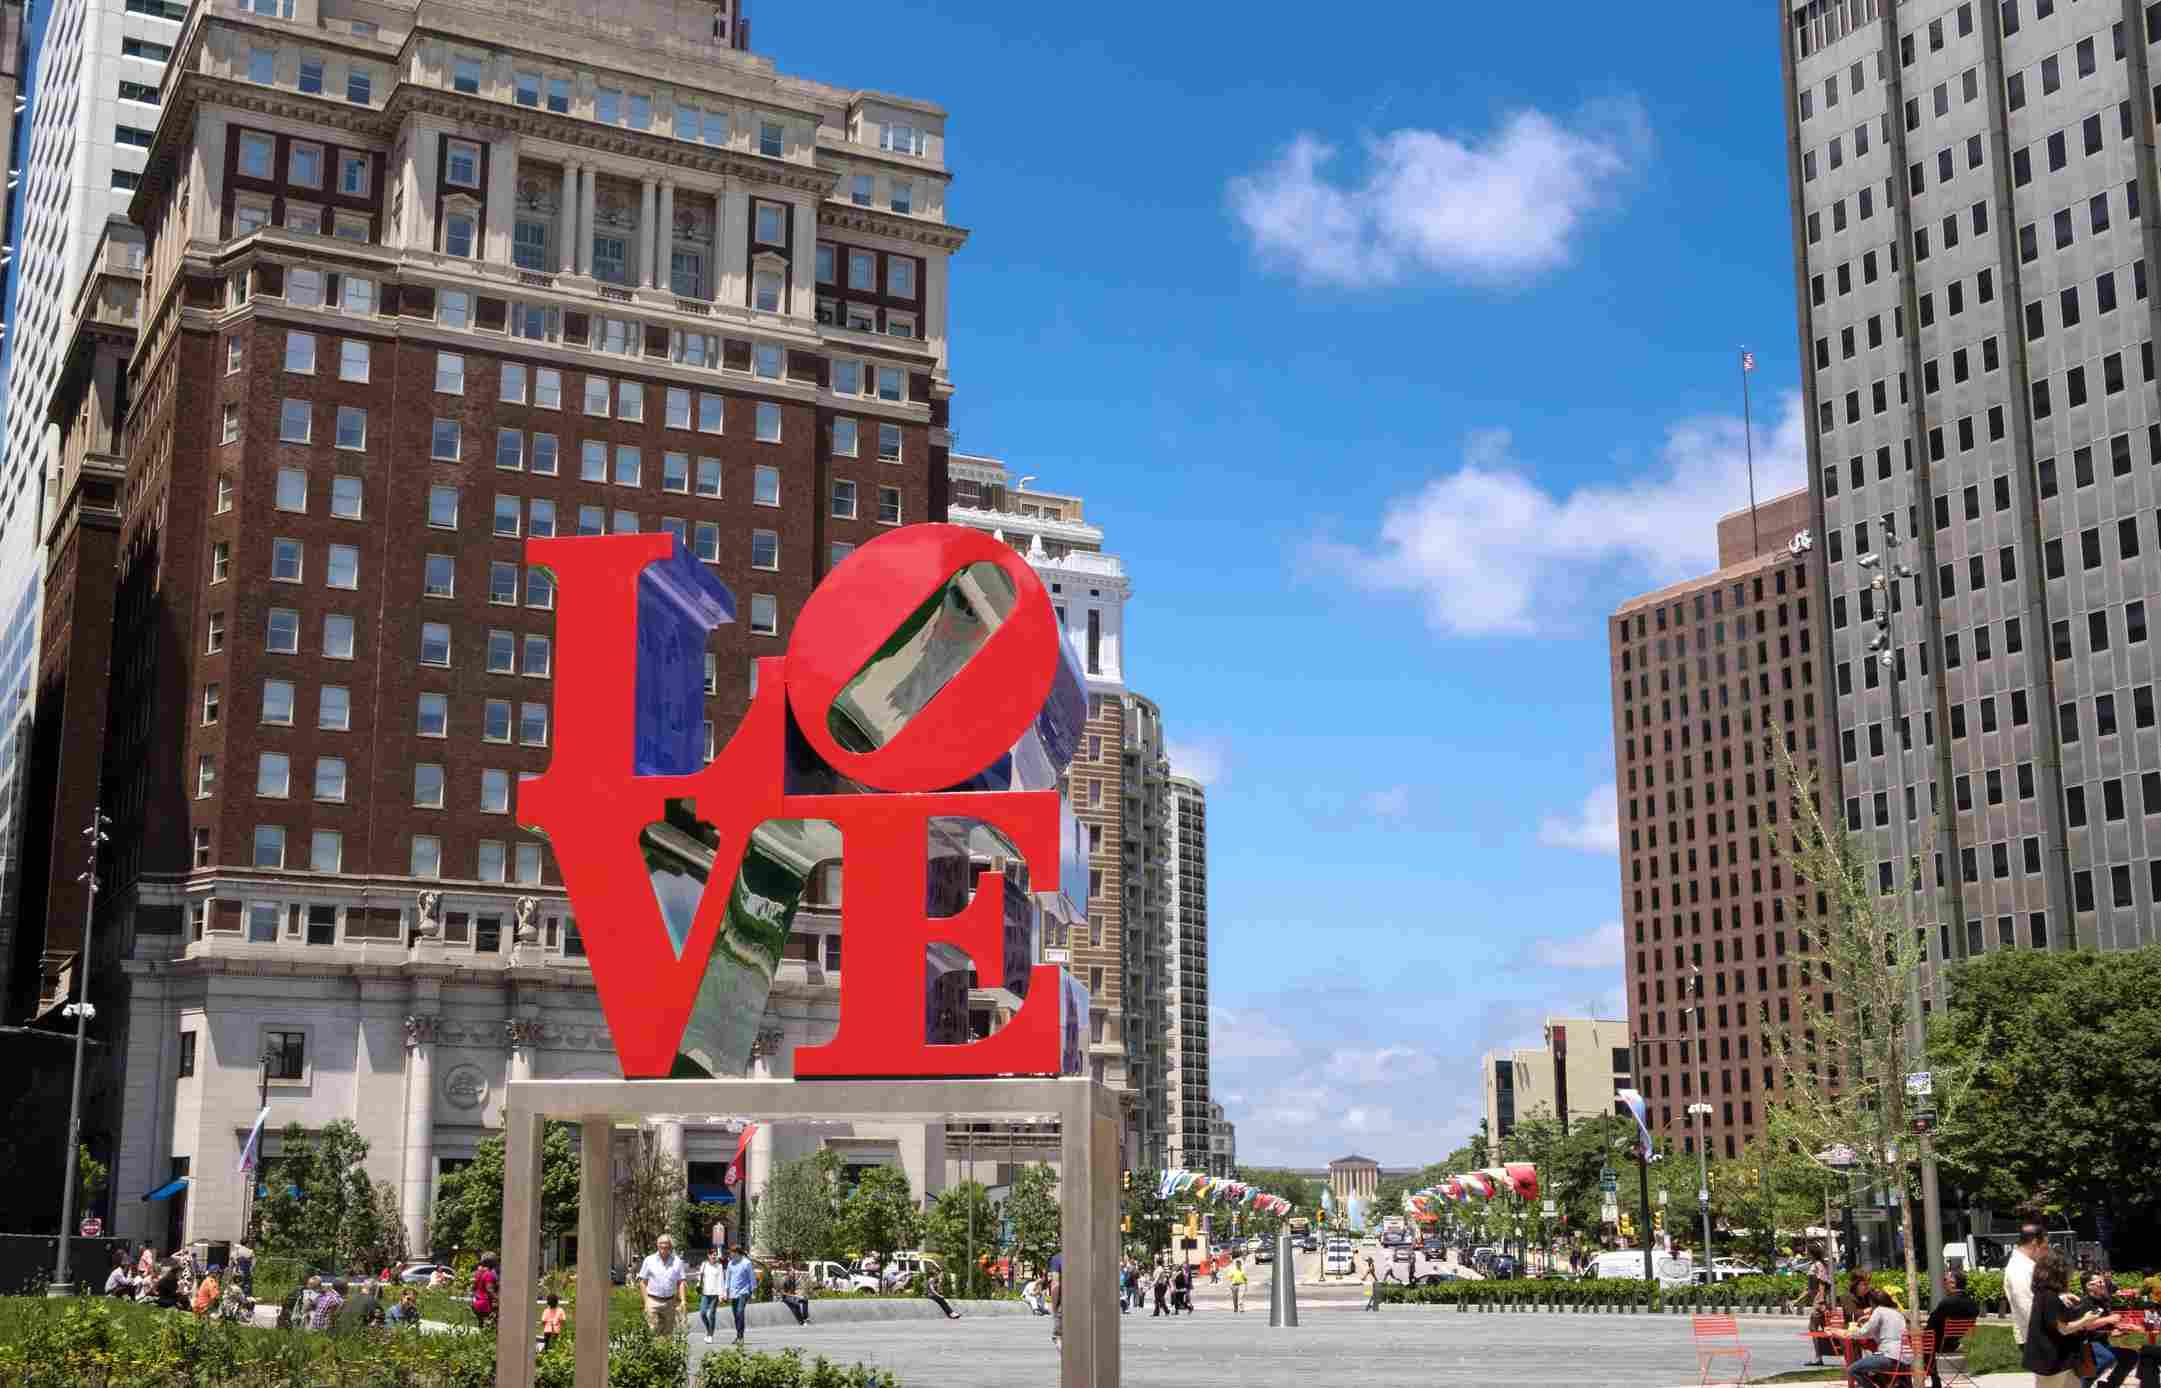 Love Park and Plaza in Summer in Center City Philadelphia